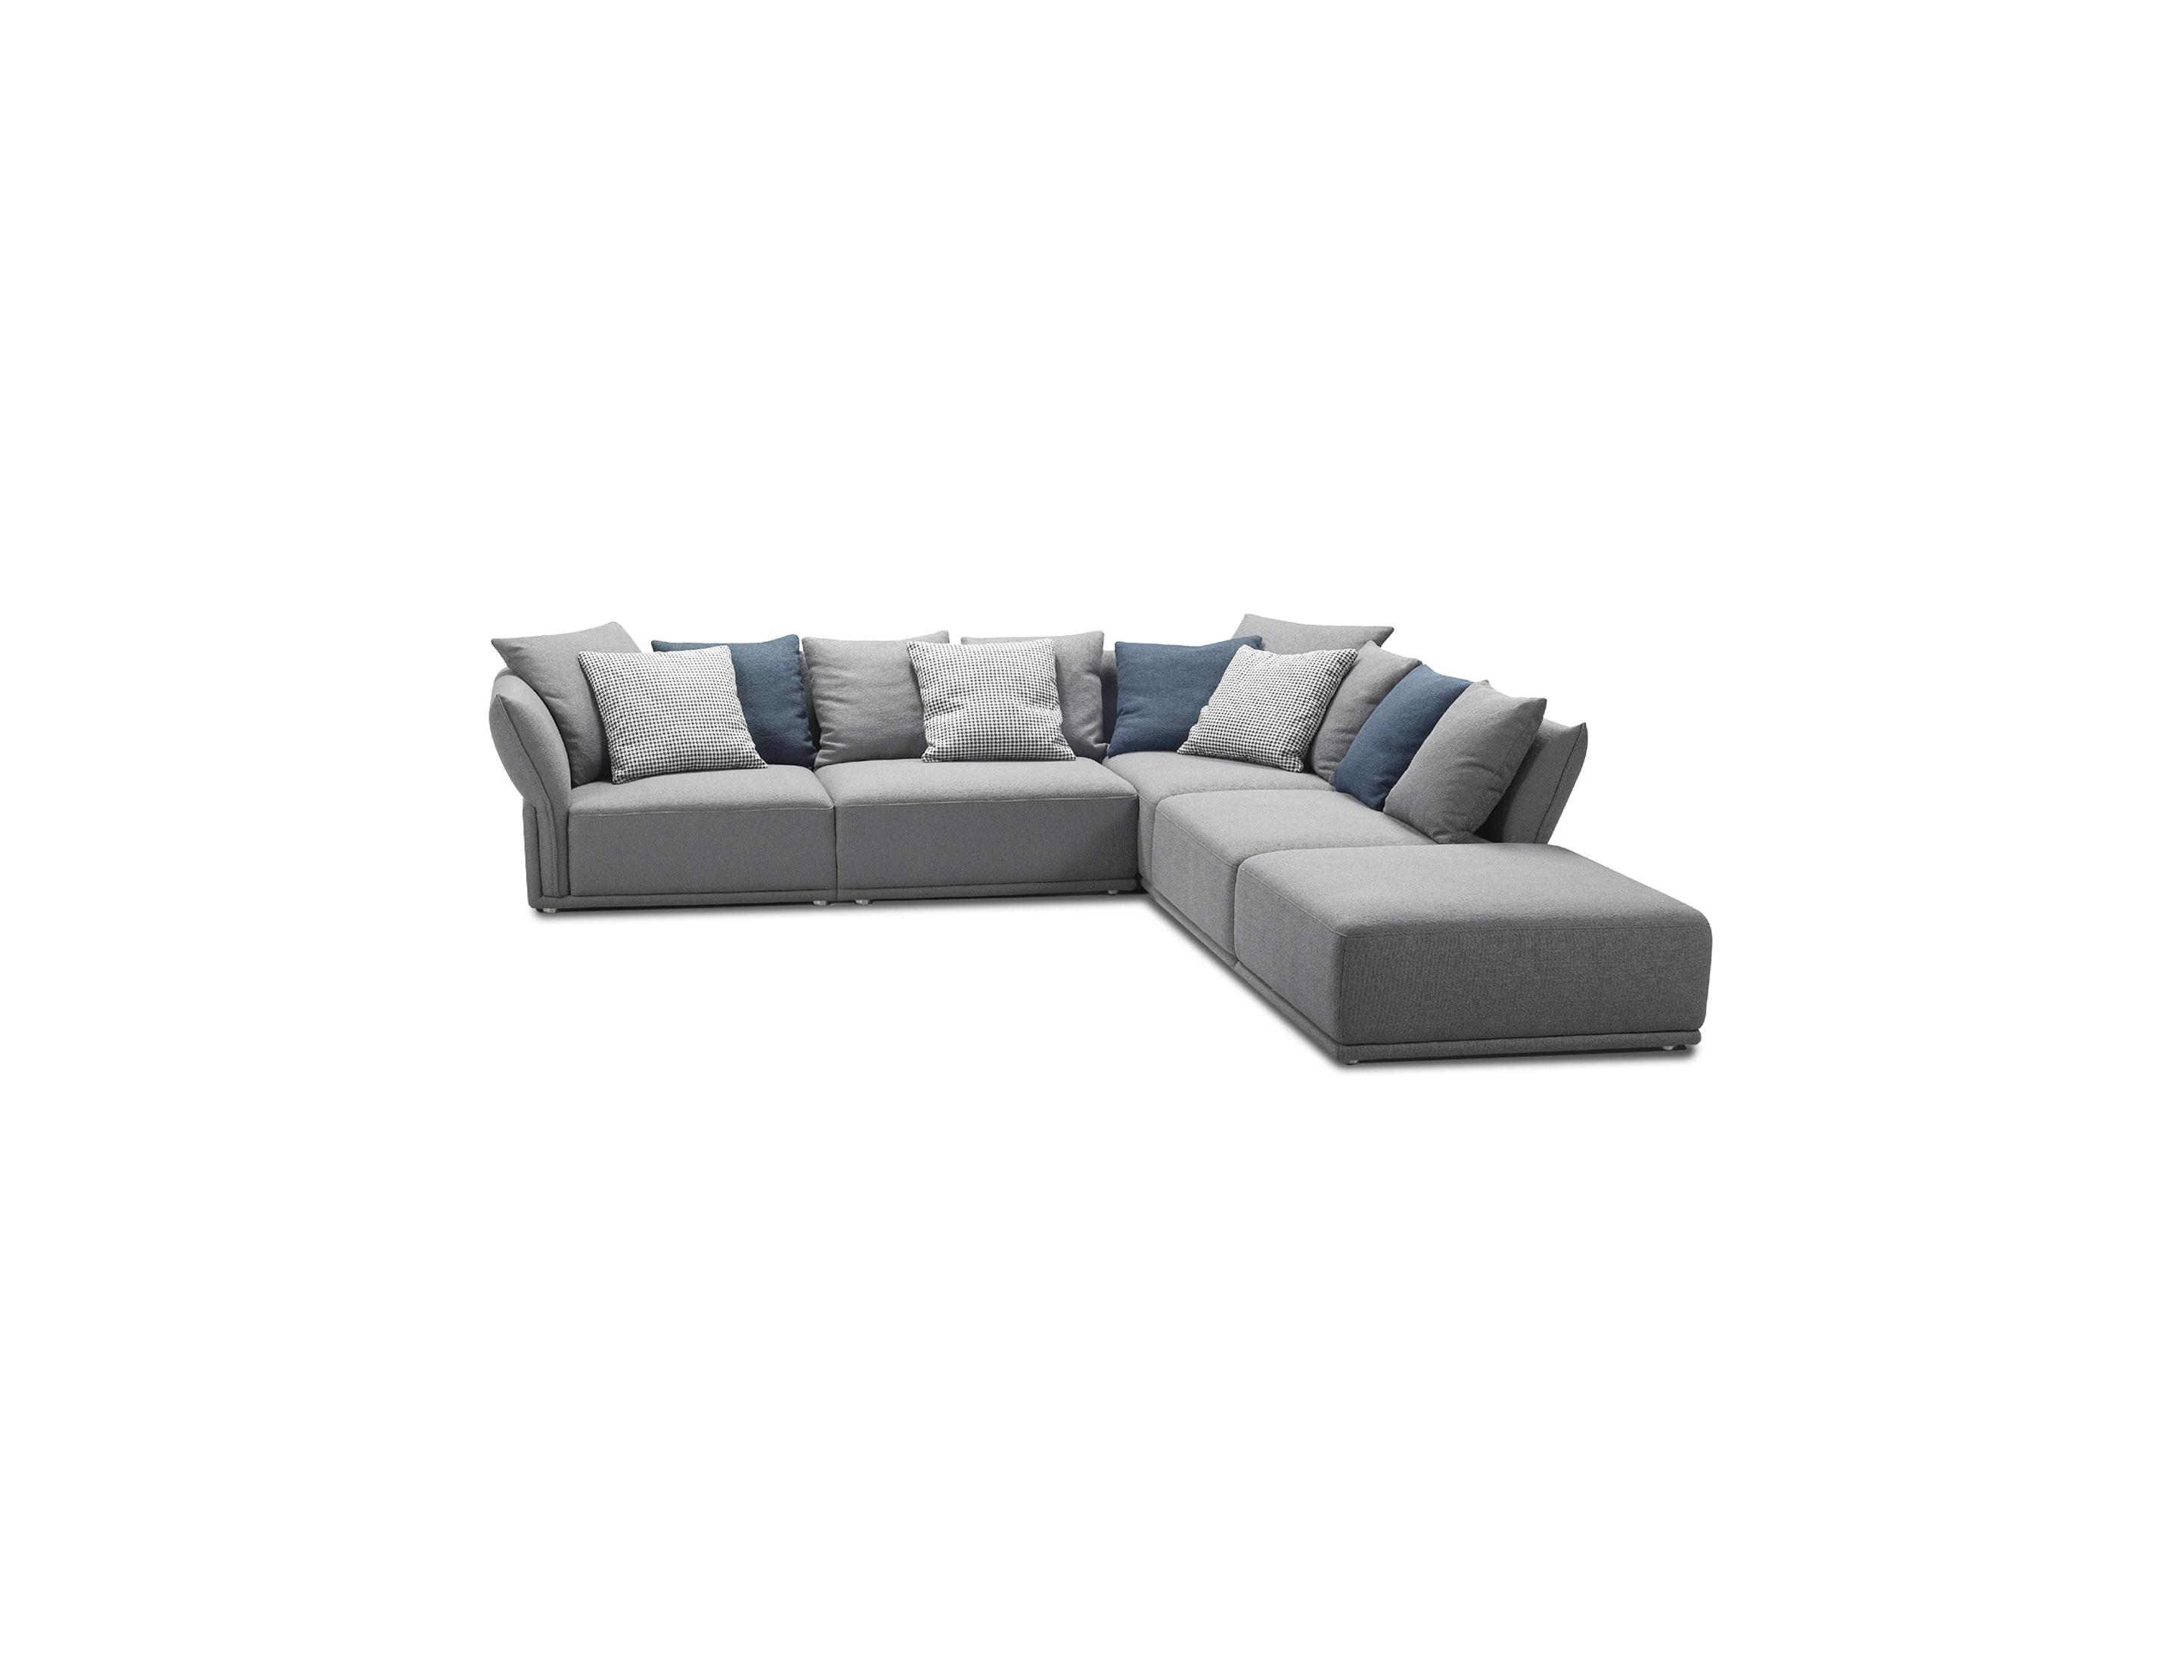 Stratus Sofa Modern Modular Sectional Set Of 5 Expand Furniture